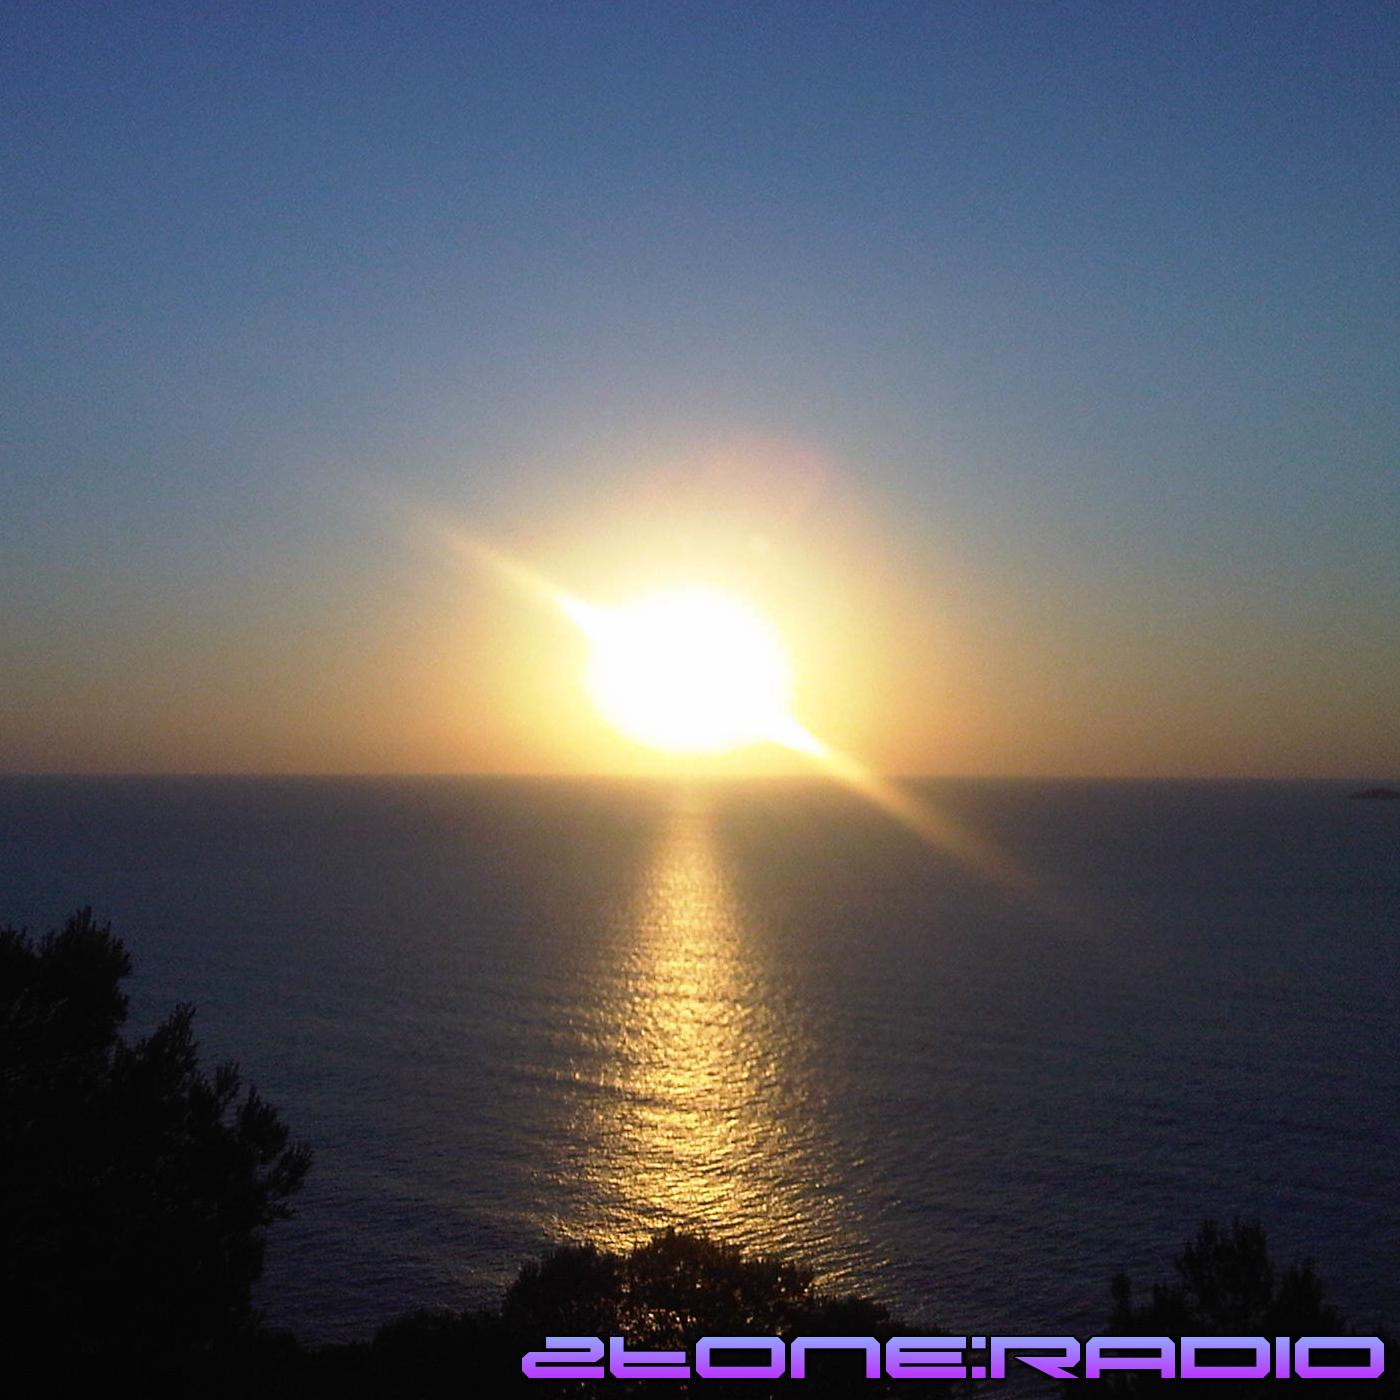 2tone:Radio